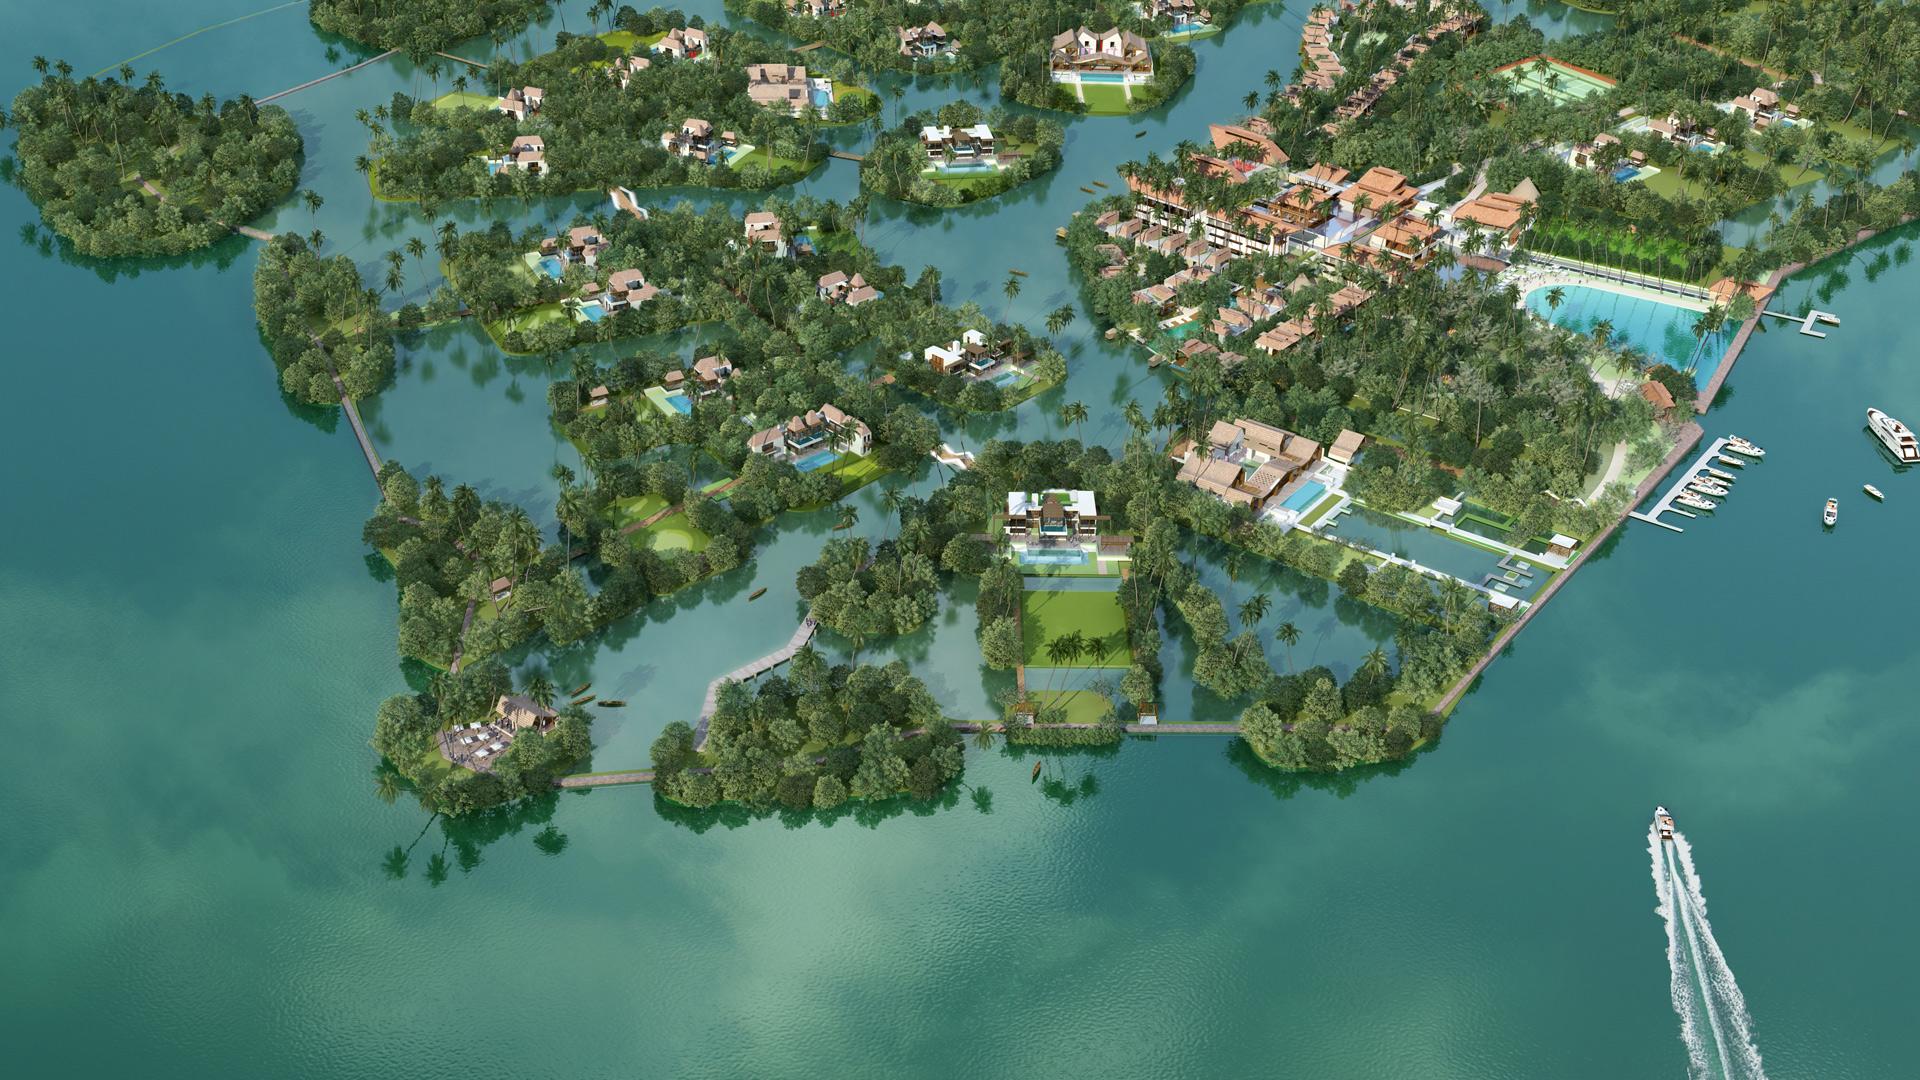 MAP-design-archipelago-archtecture-islands-goa-architect-kiran-mathema-aerial-view